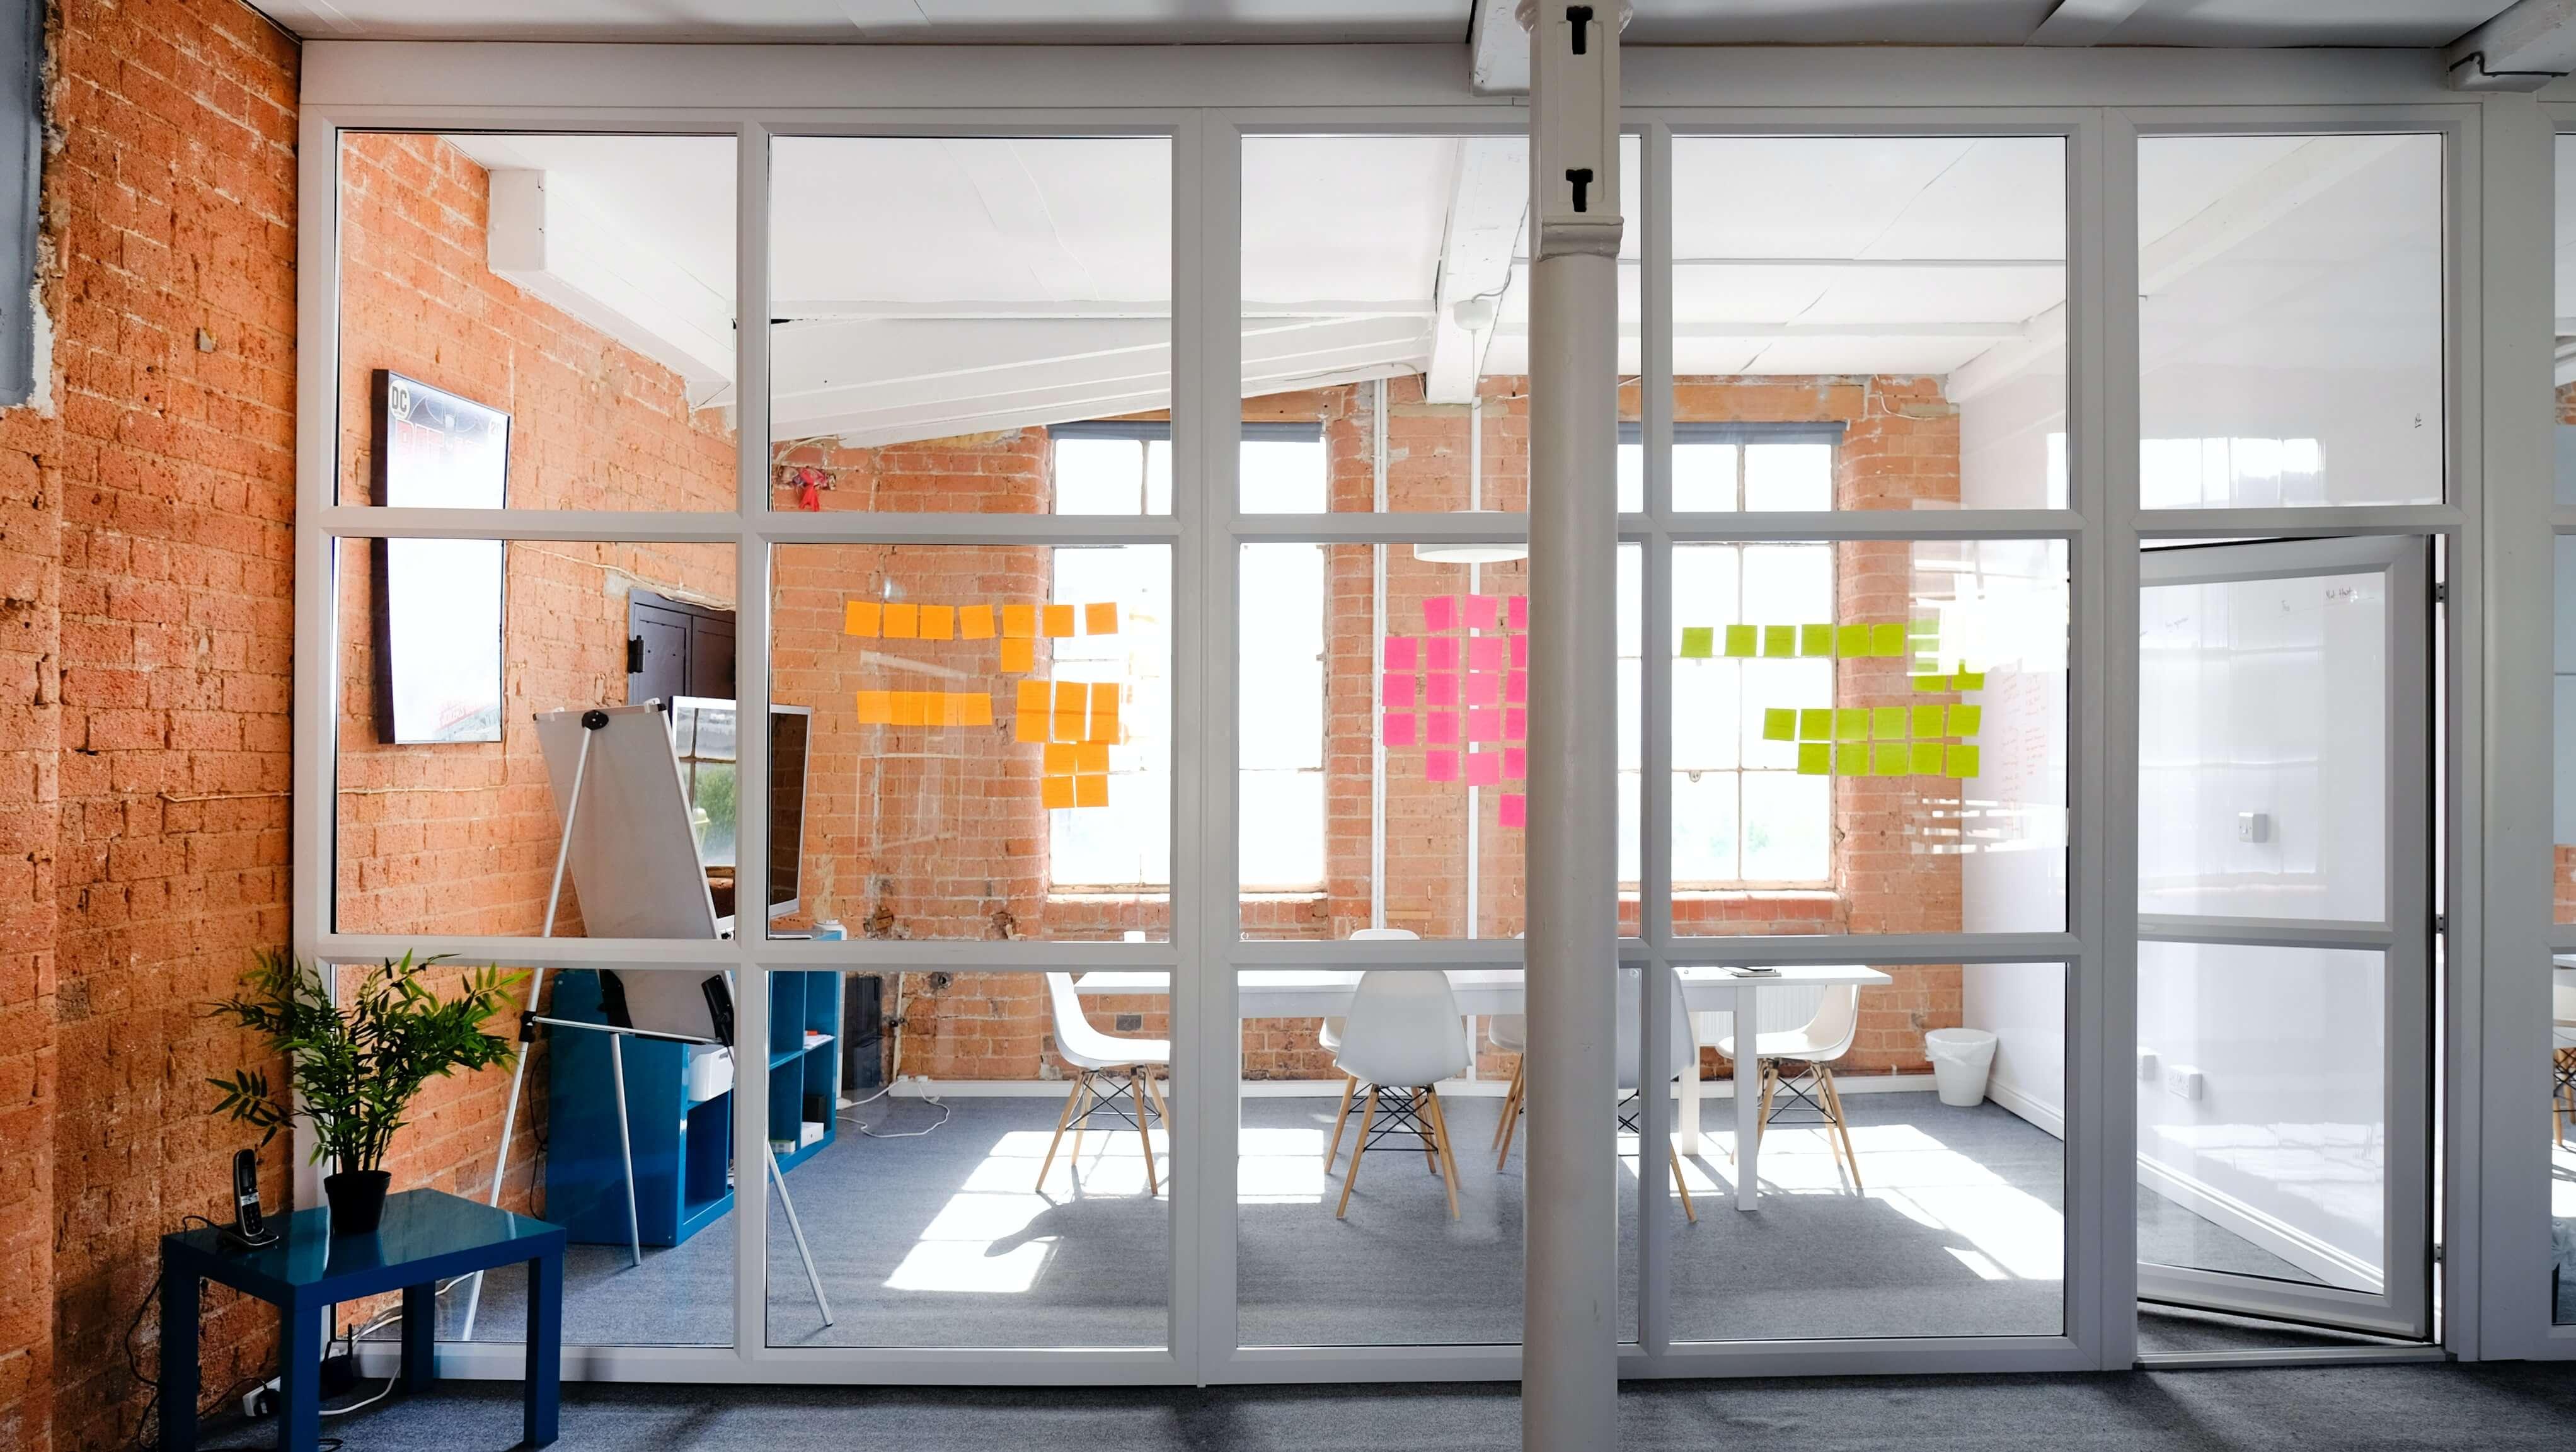 Life in lockdown: a Nottingham digital agency UX review